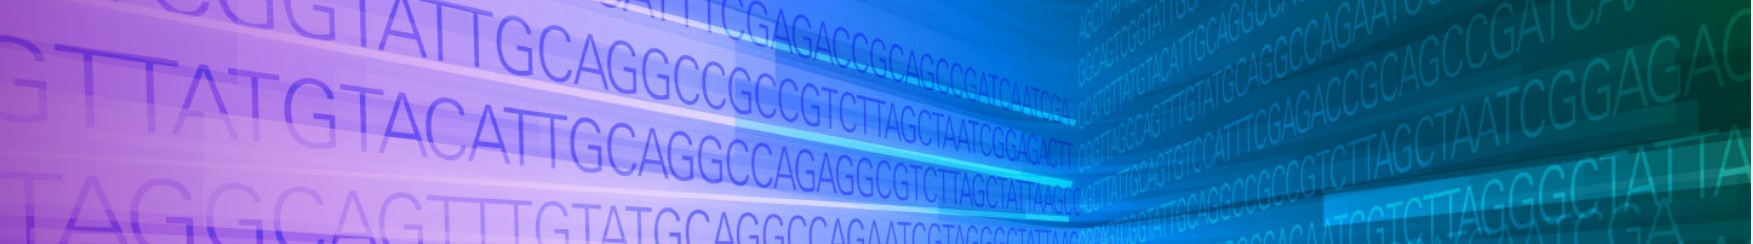 Takara Live Webinar: Total RNA sequencing of liquid biopsies Thursday, March 26, 2020, 10:30 AM CET